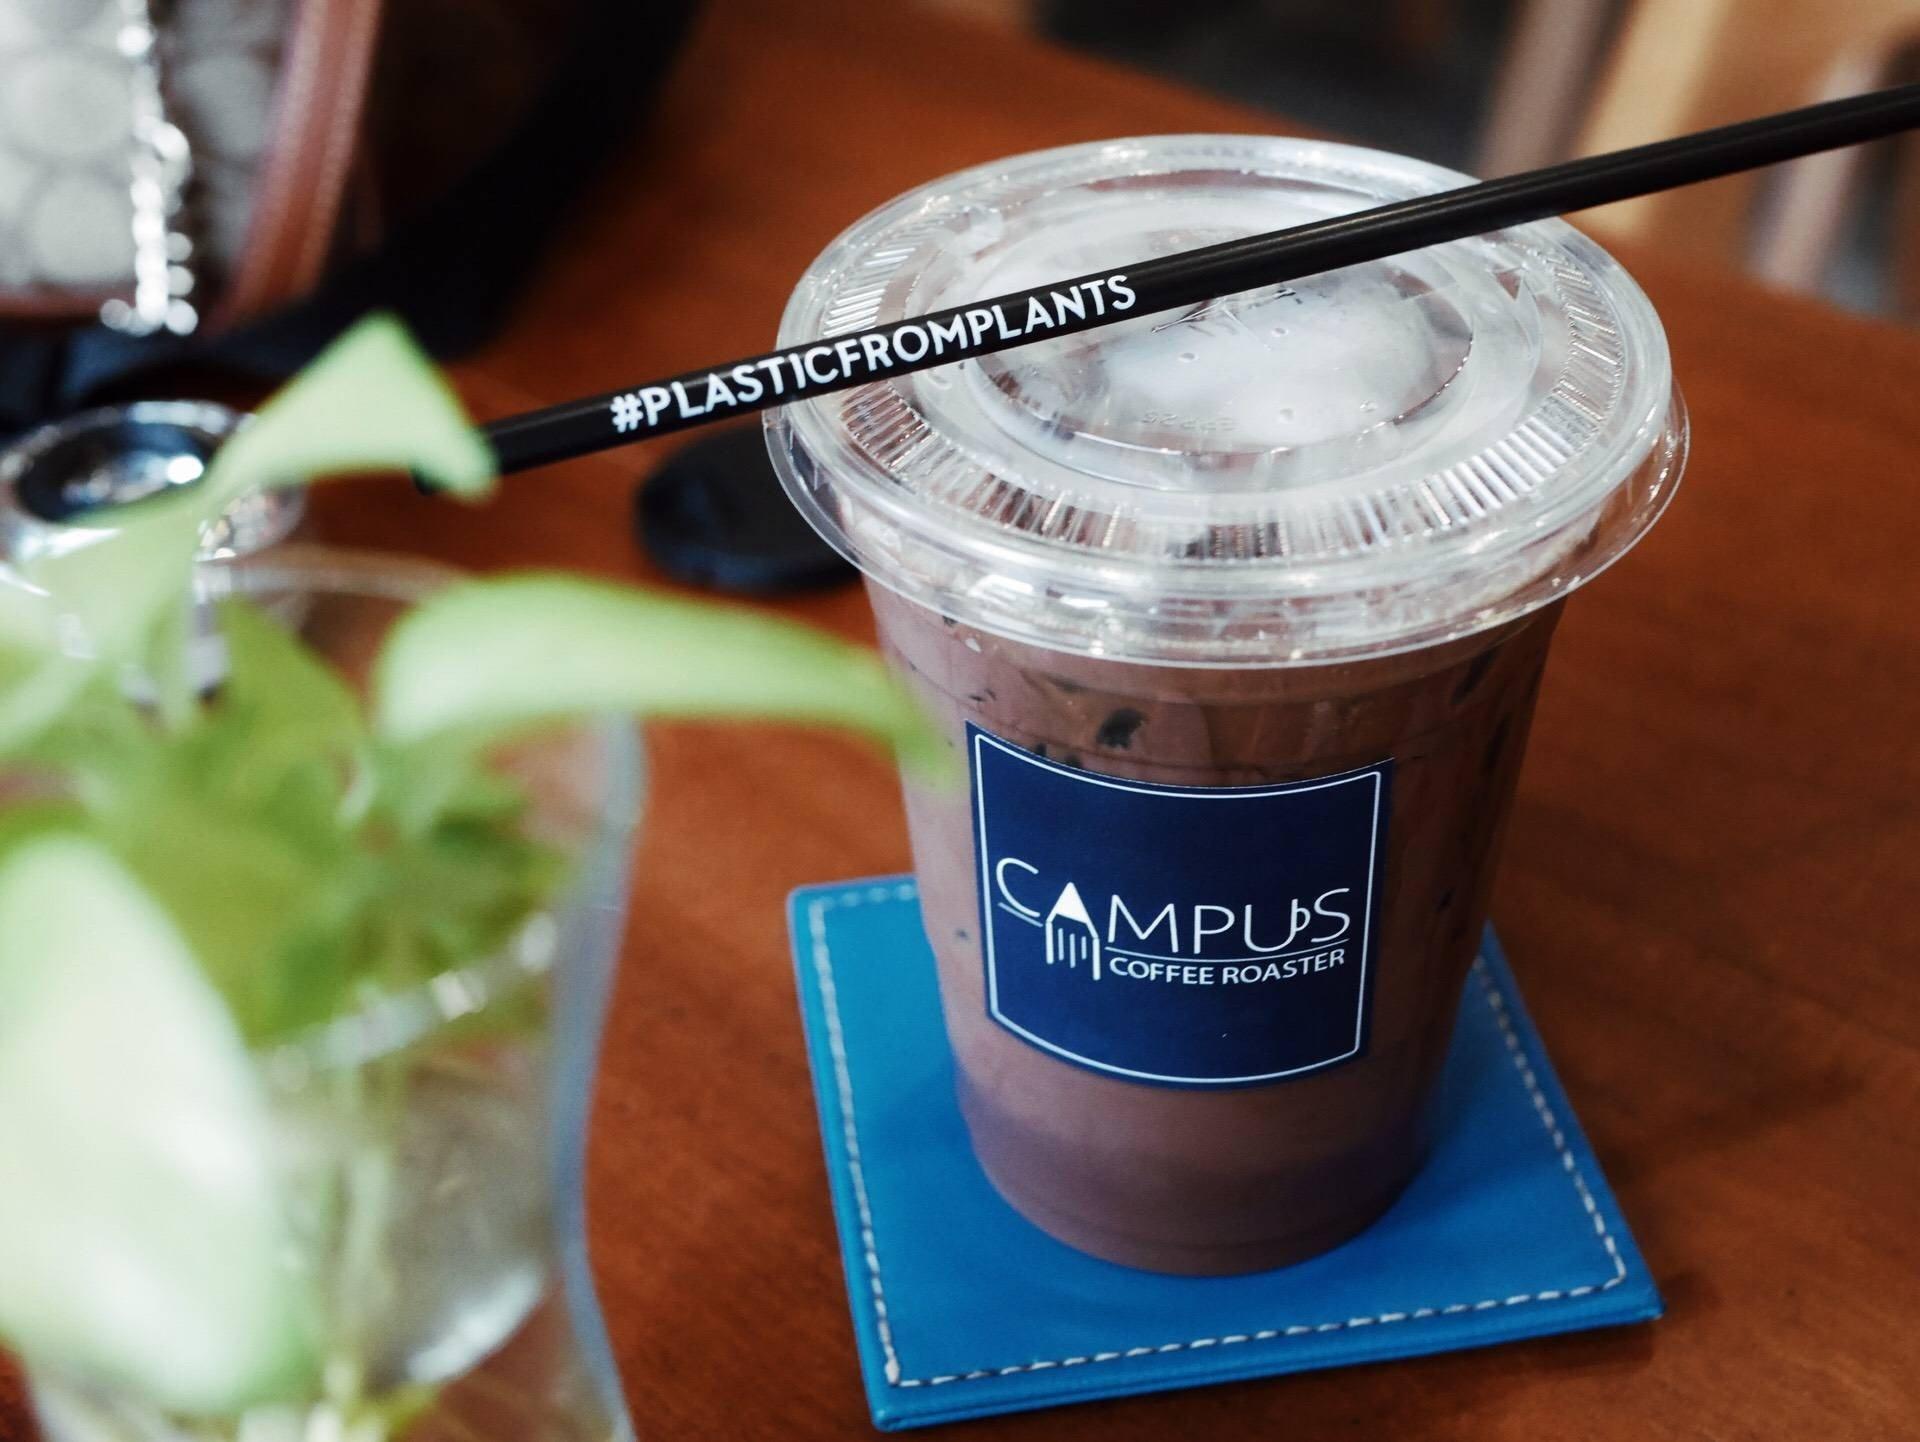 Campus Coffee Roaster